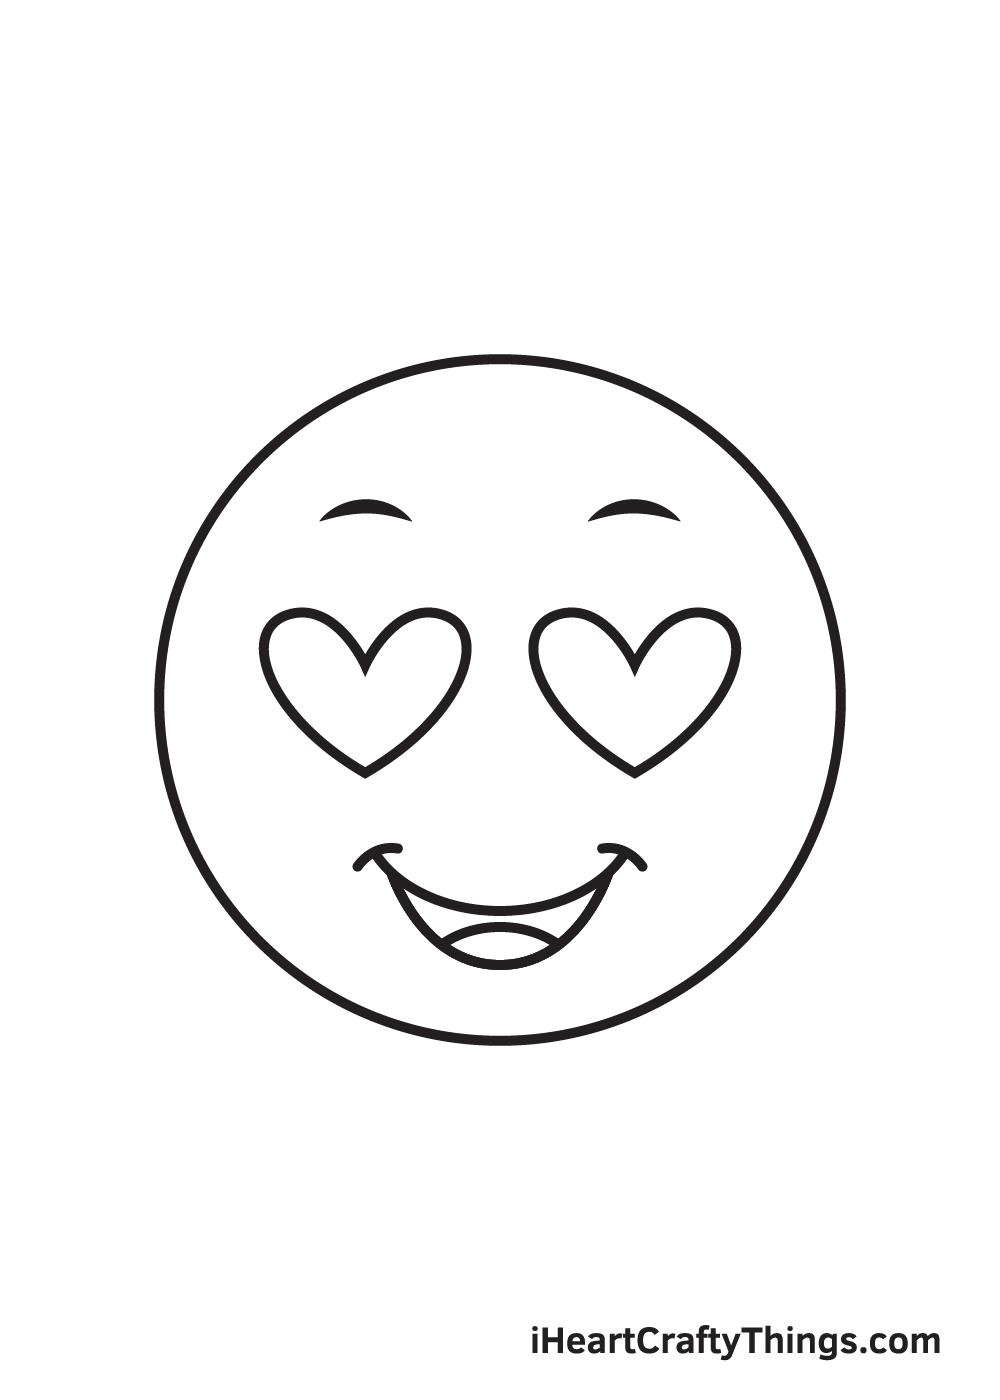 Emojis Drawing – Step 8